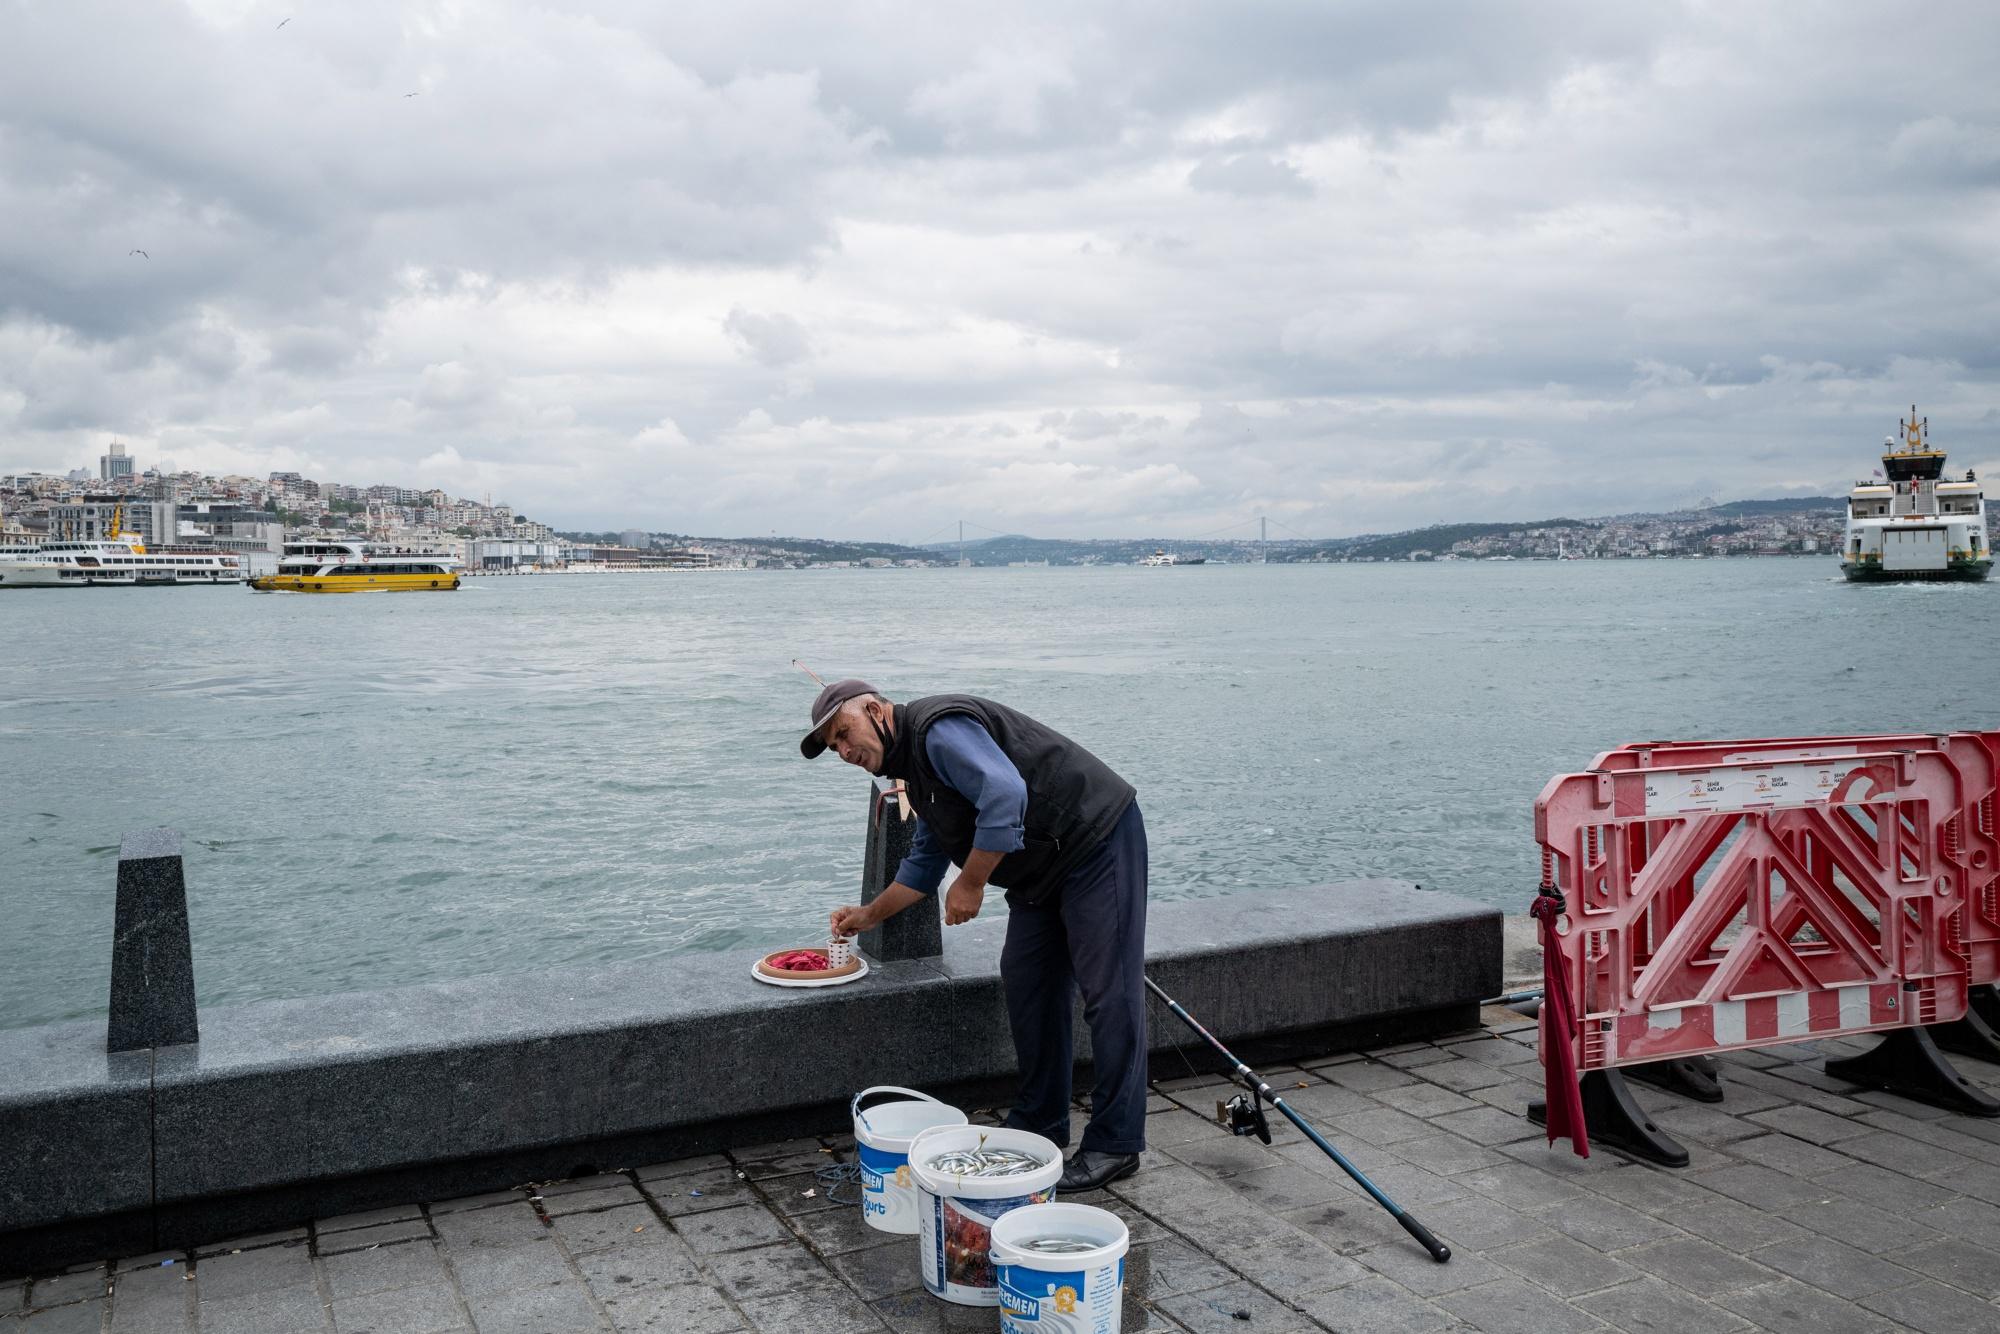 Turkish Lira Reaches Record Low on Erdogan Rate-Cut Demand